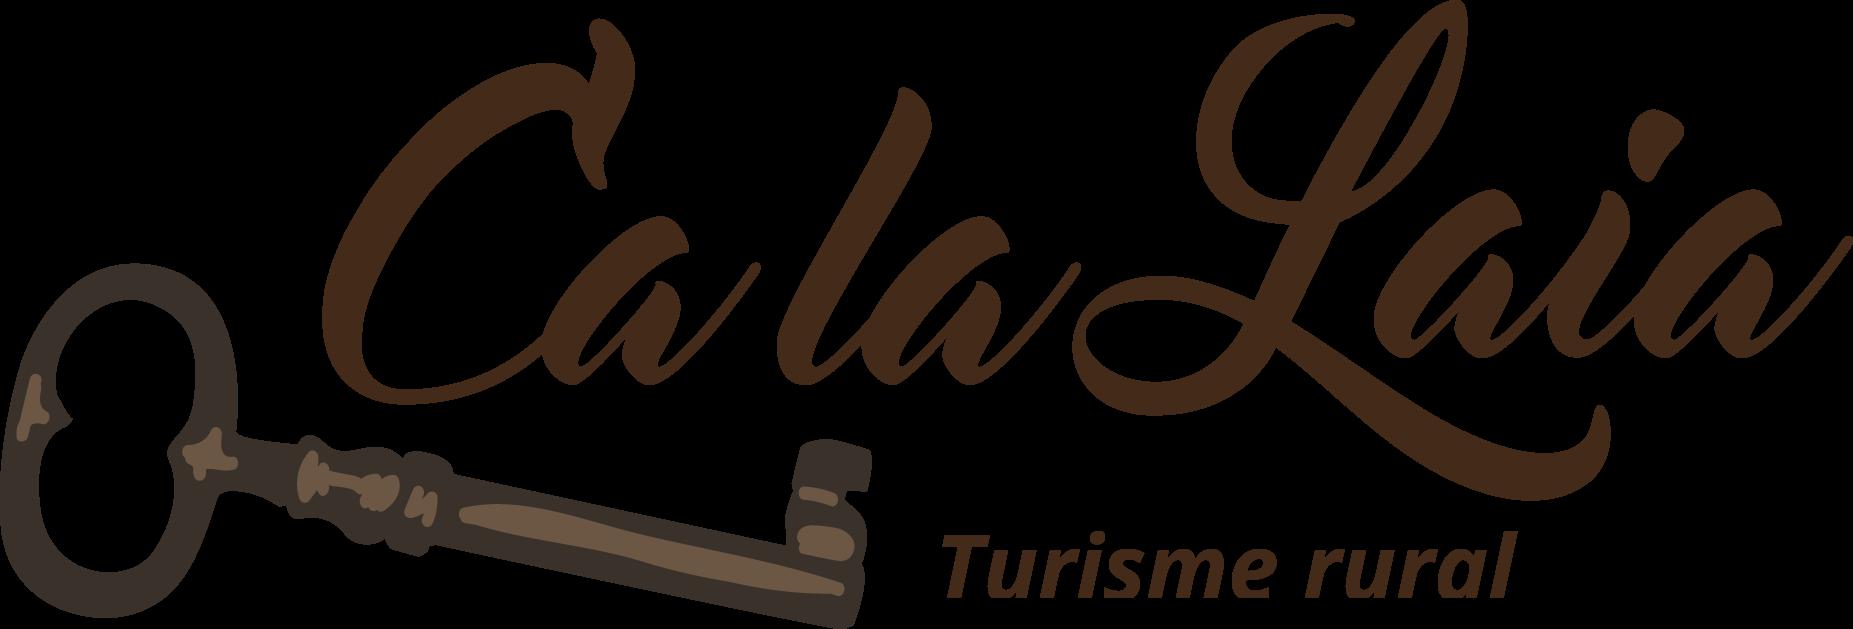 logo Ca la Laia